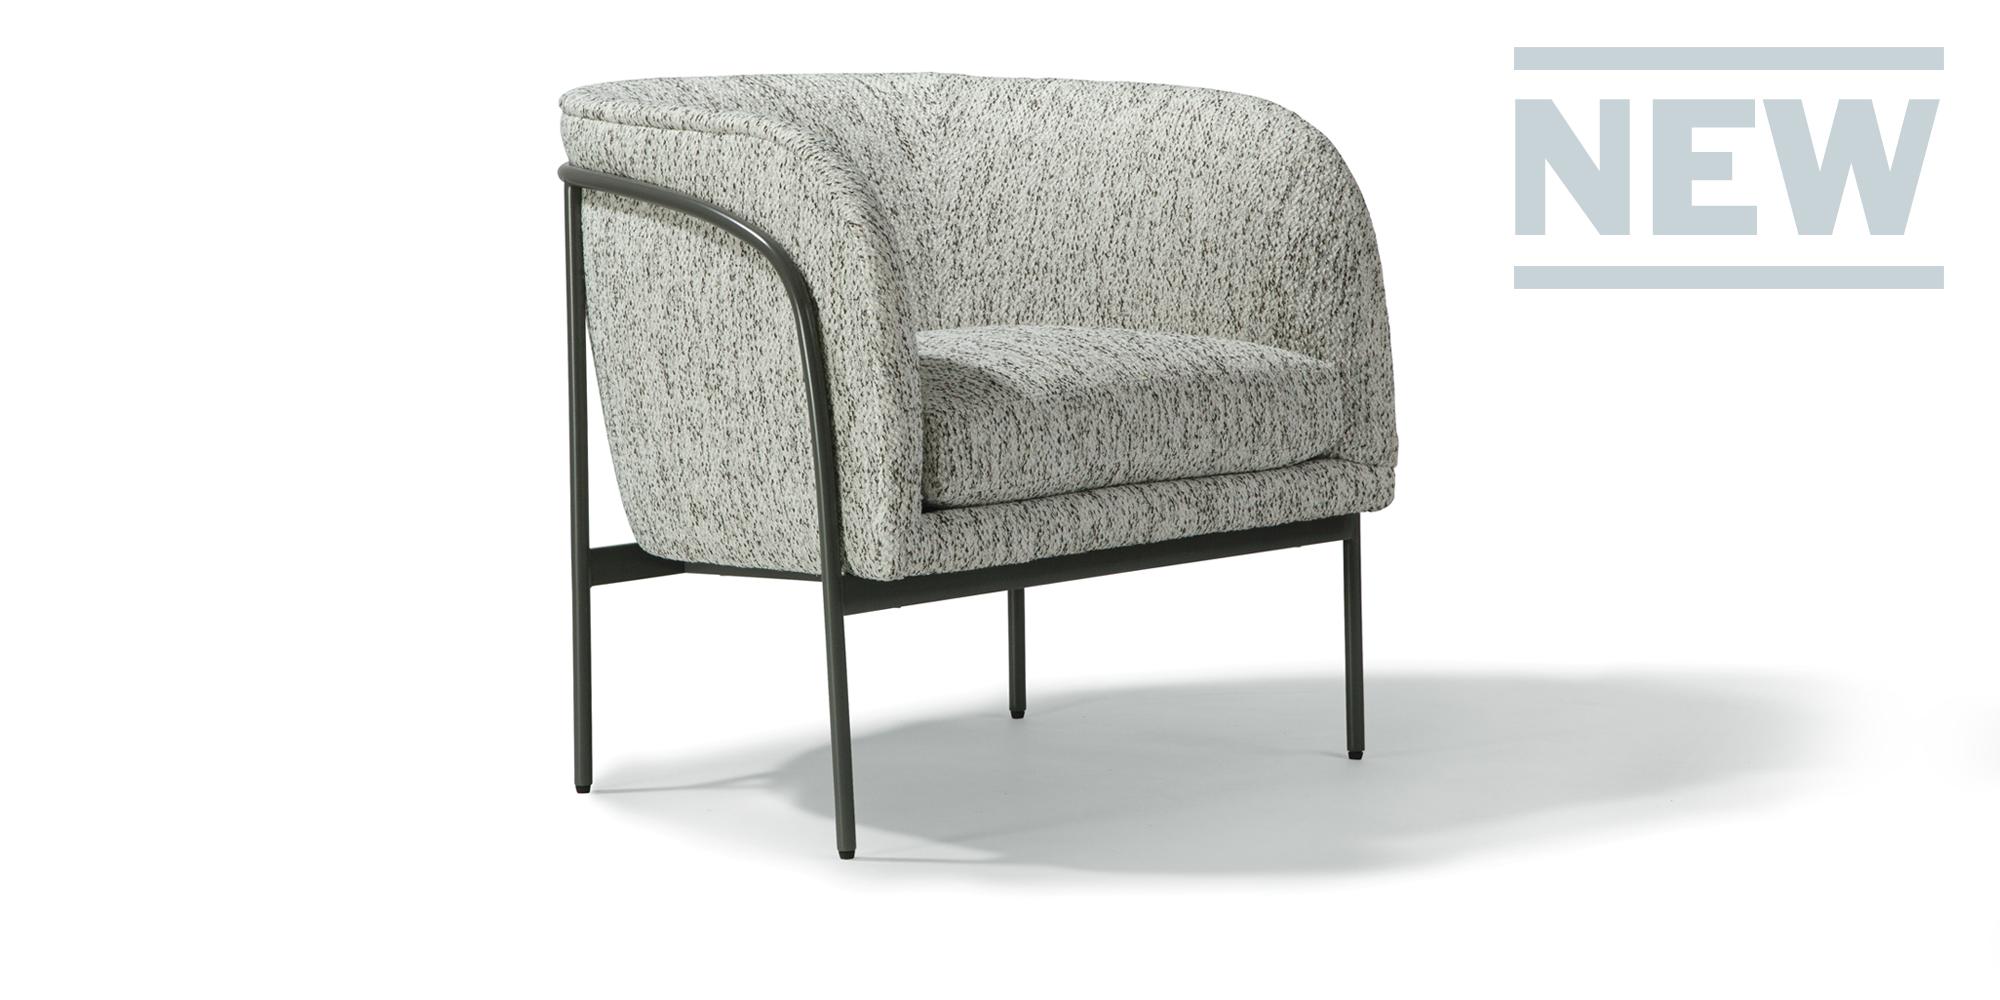 Rod Chair (Gray Powder Coat)